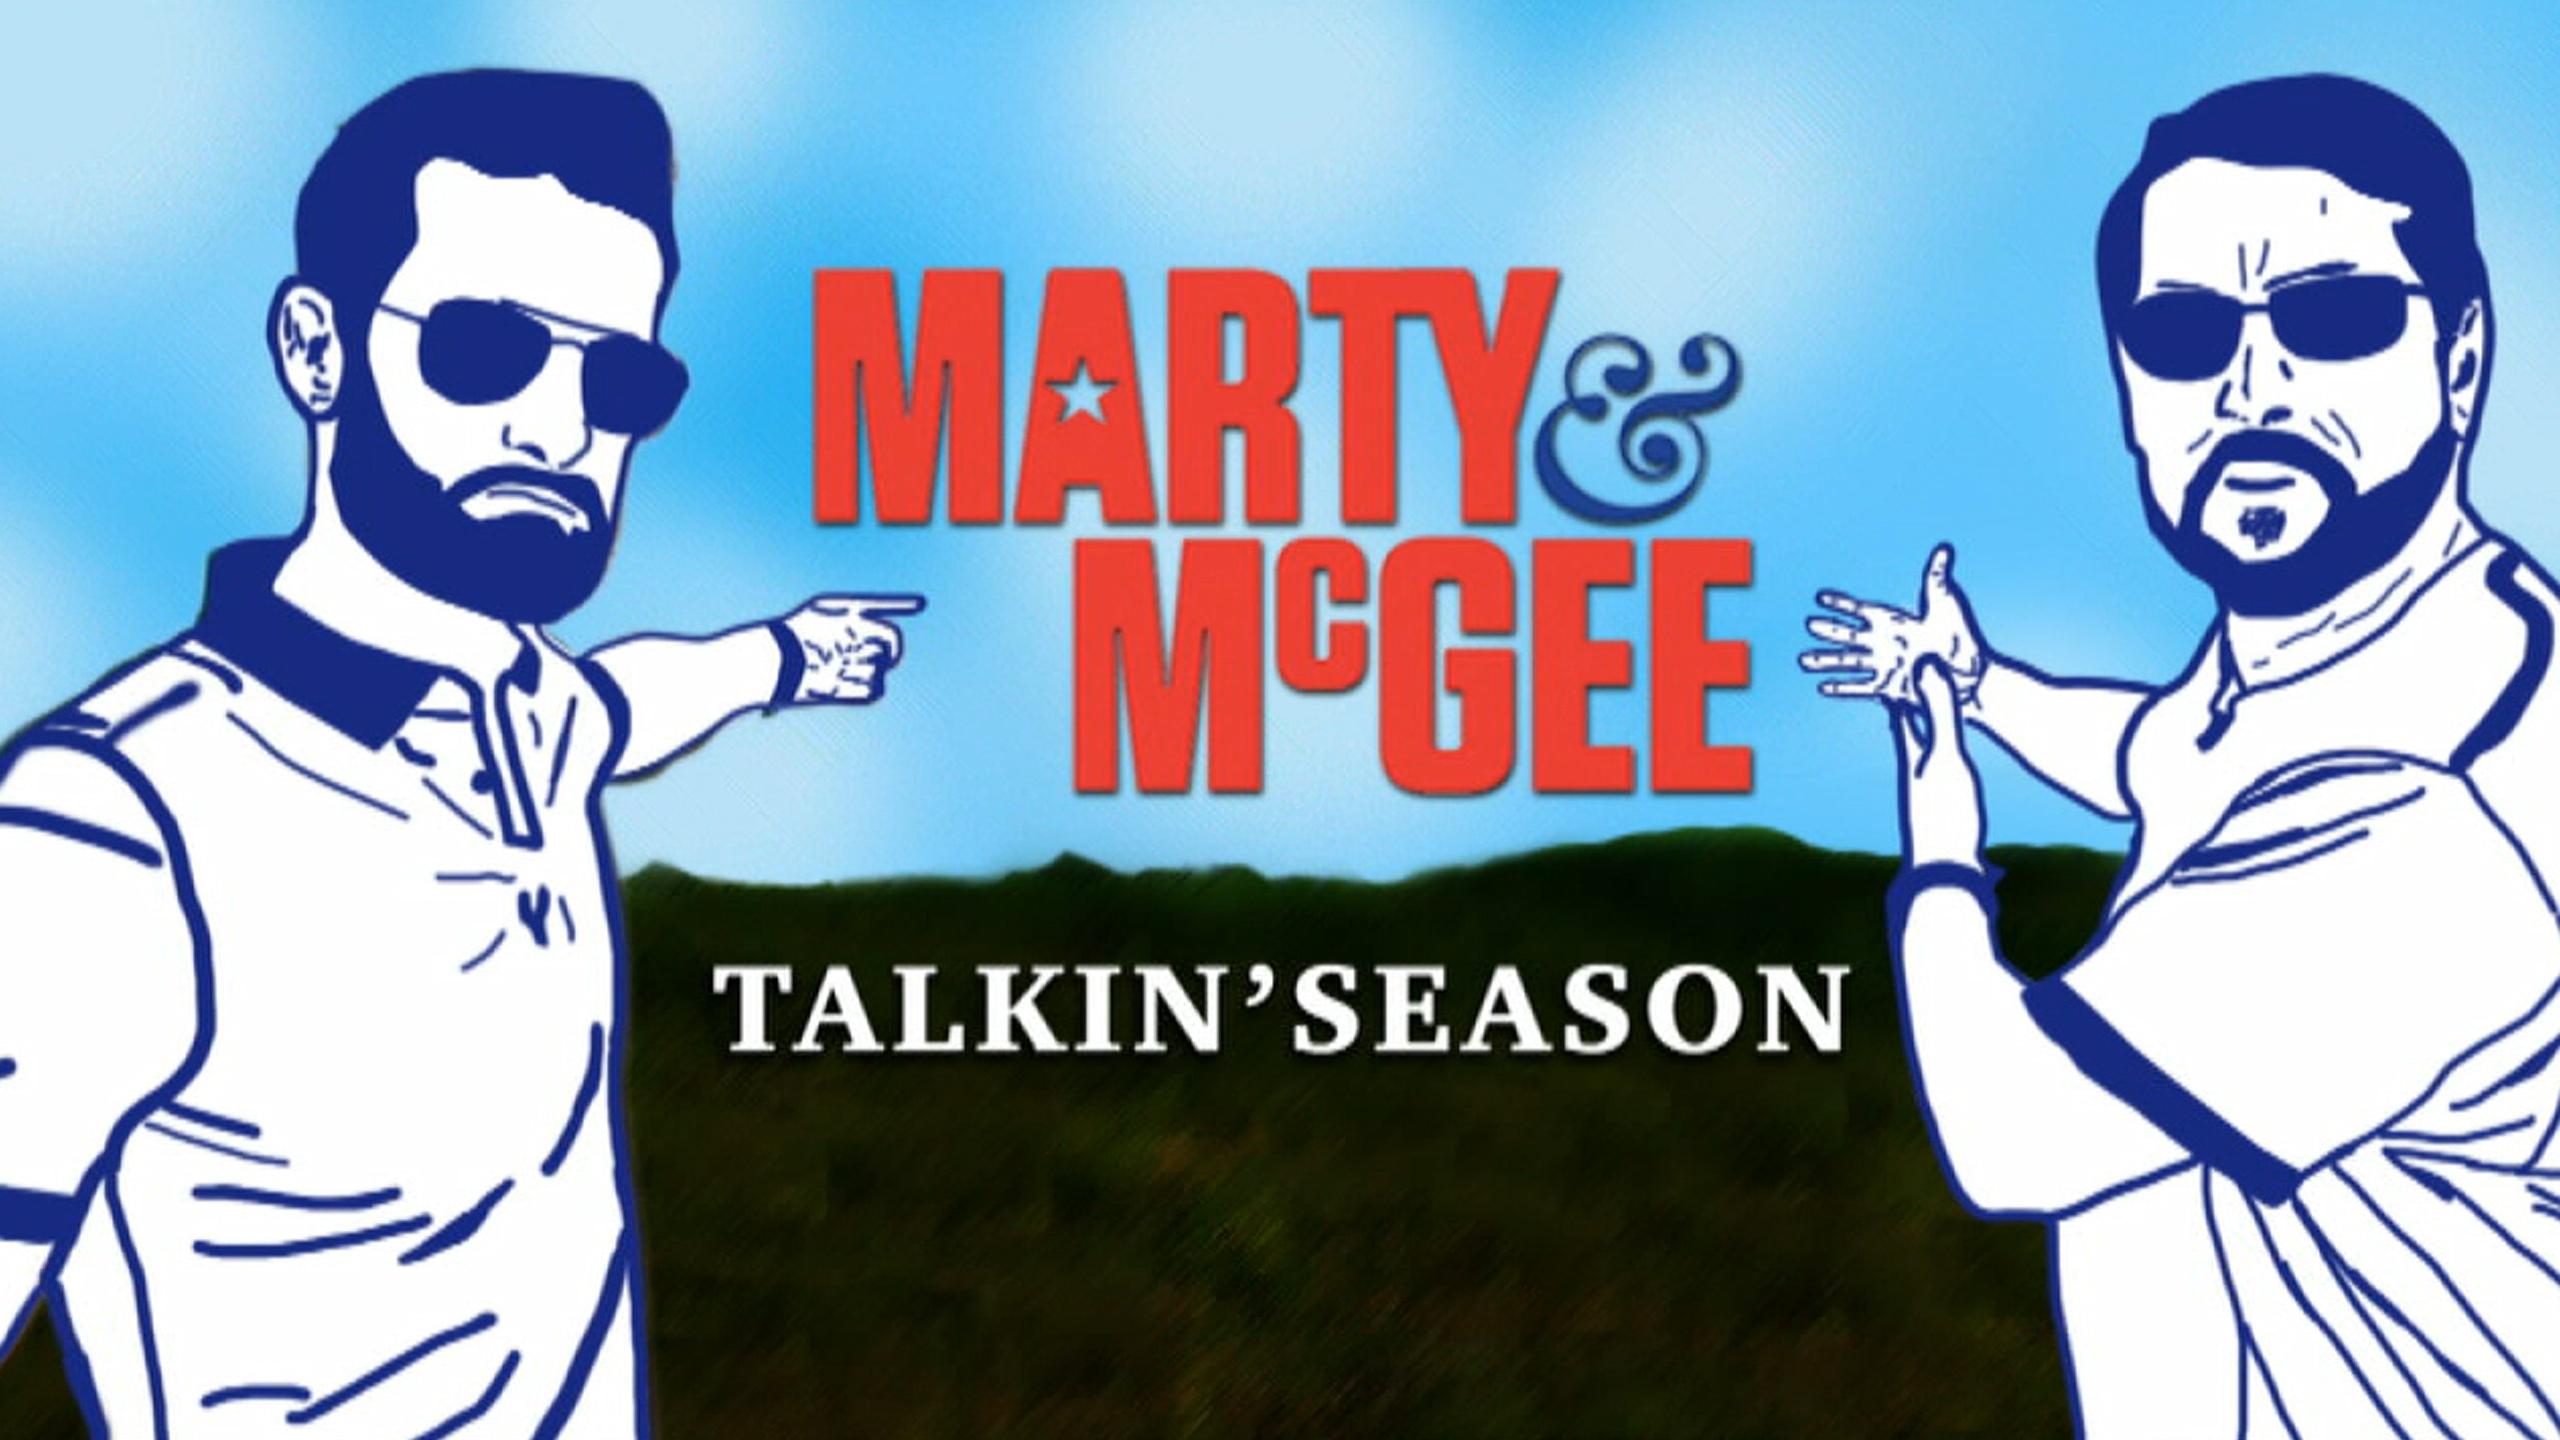 Marty & McGee: Talkin' Season – SEC East Coaches